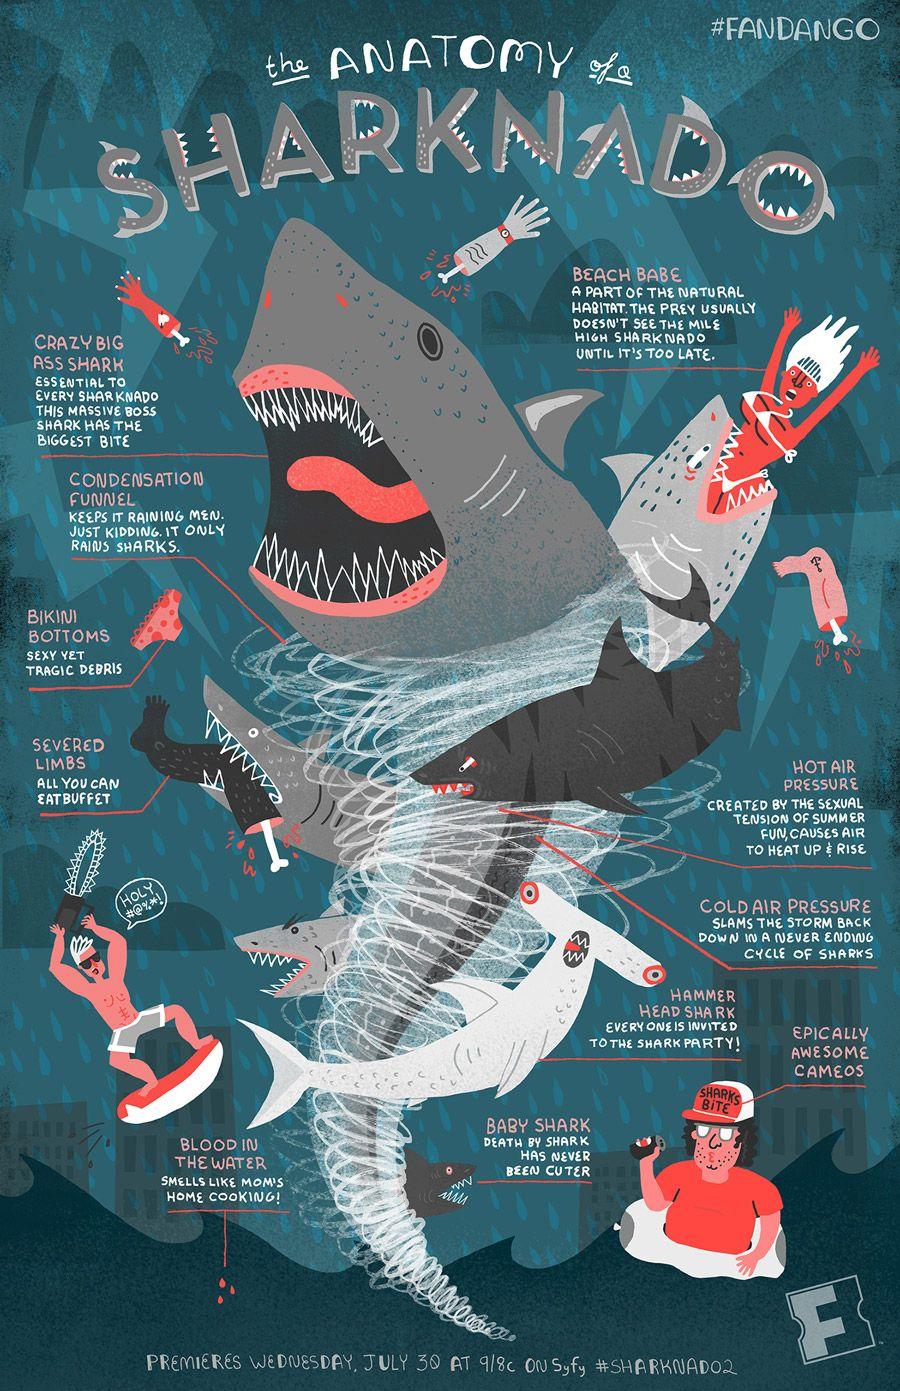 Infographic Anatomy Of Sharknado Icthyology 2014